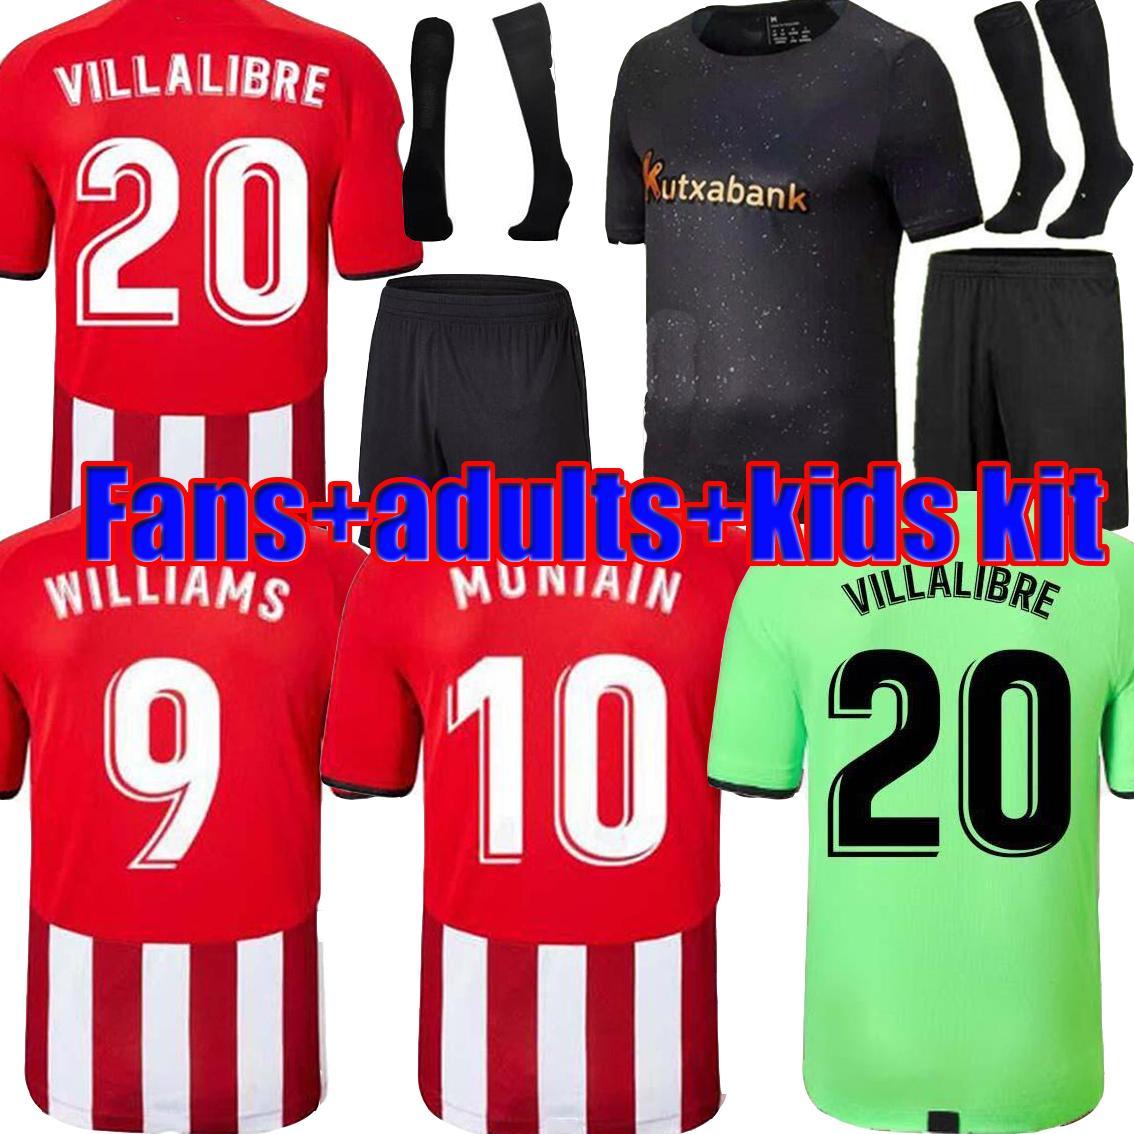 Athletic 21/22 Bilbao Williams Accueil Jerseys de football I.Martinez Raul Garcia Jersey de football Yuri B. Muniaiin Yeray Shirts Kit pour enfants adulte Camiseta de Leones